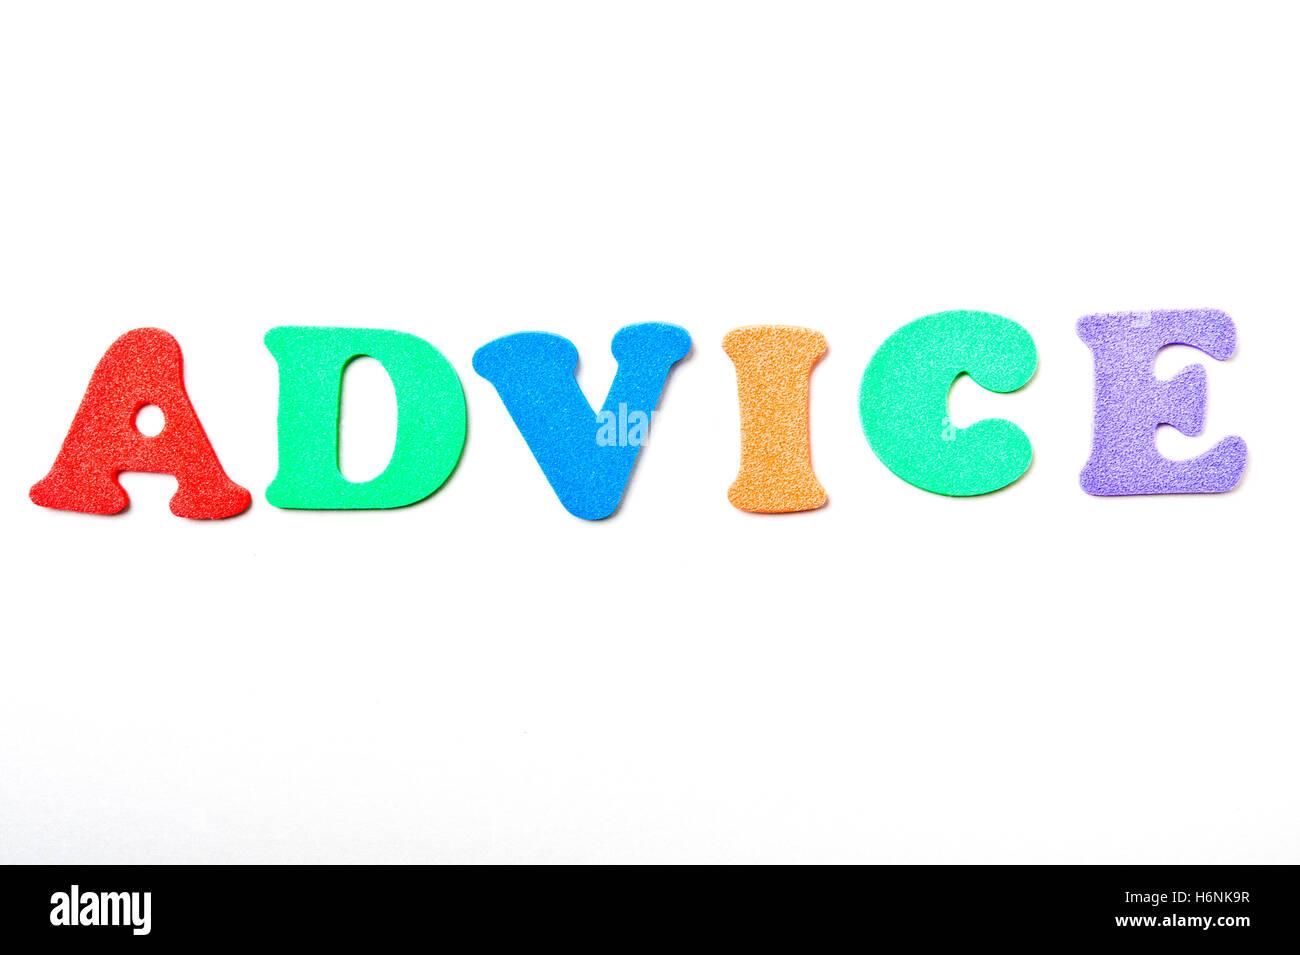 word advice - Stock Image